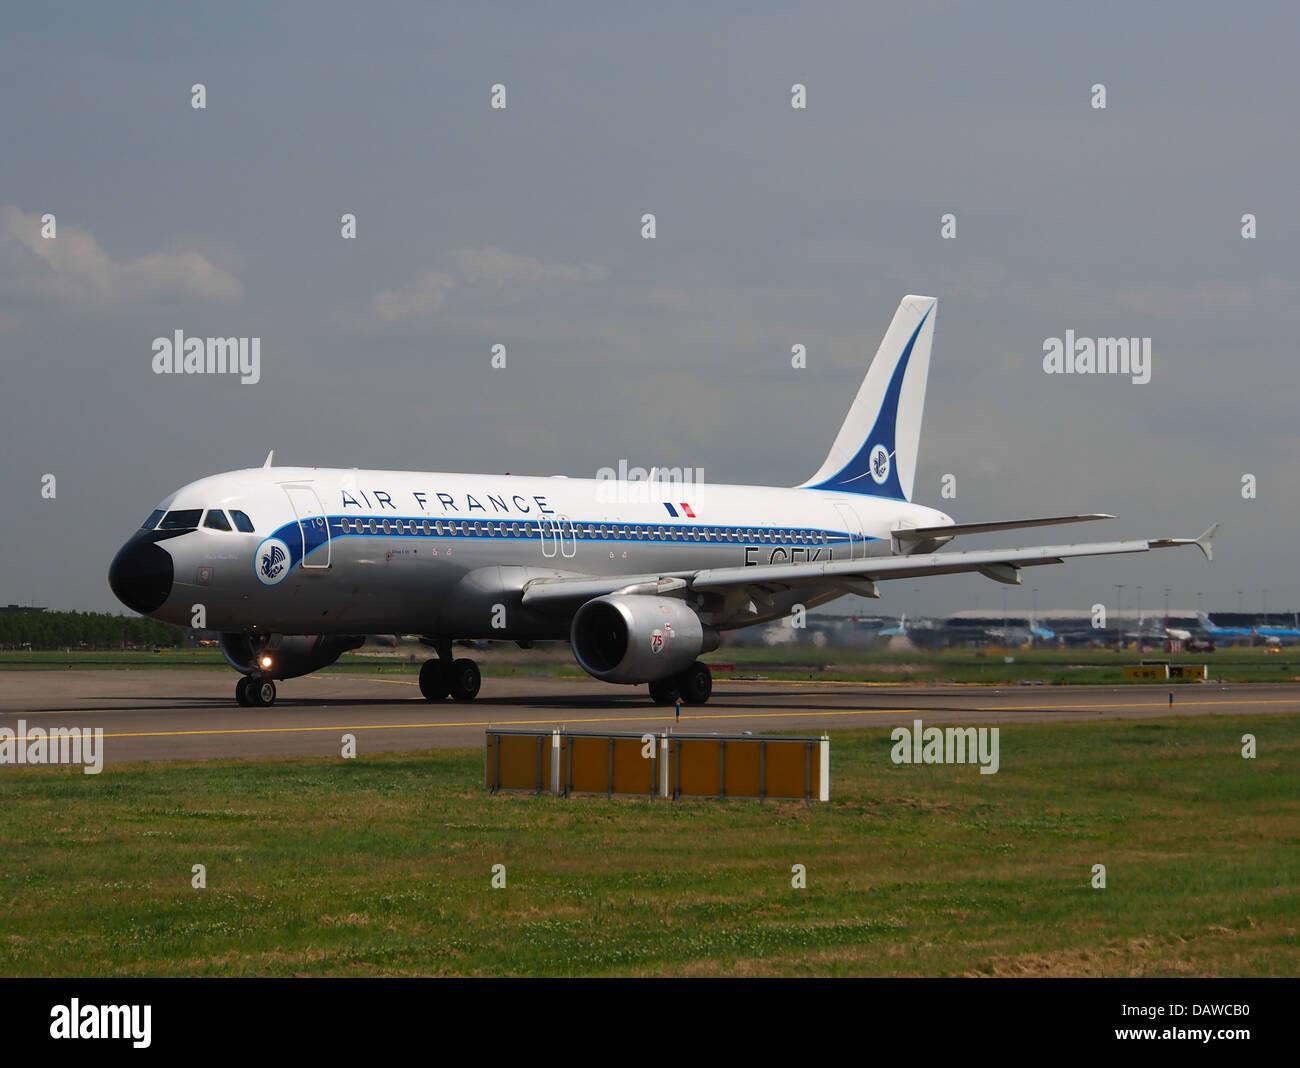 F-GFKJ Air France Airbus A320-211 - cn 063 - 1 Photo Stock